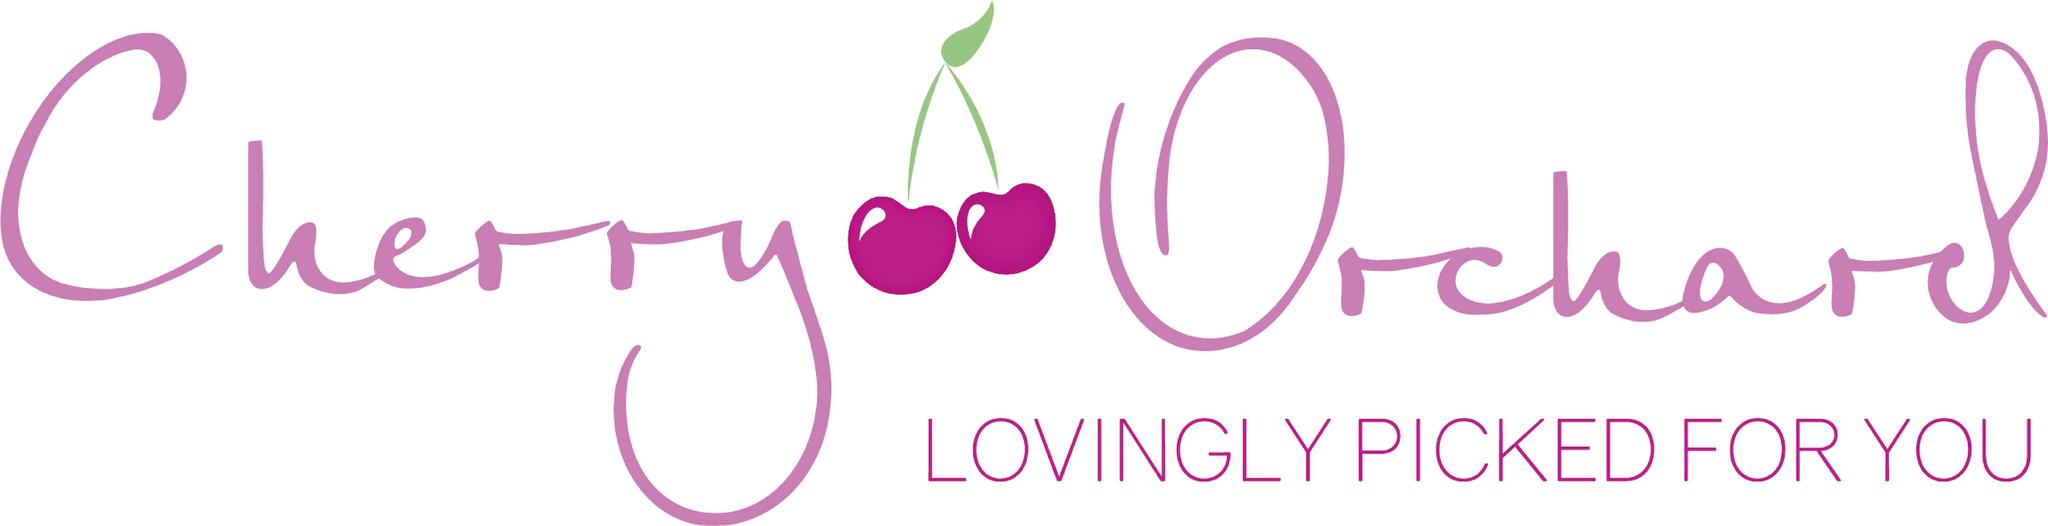 Cherry Orchard Publishing